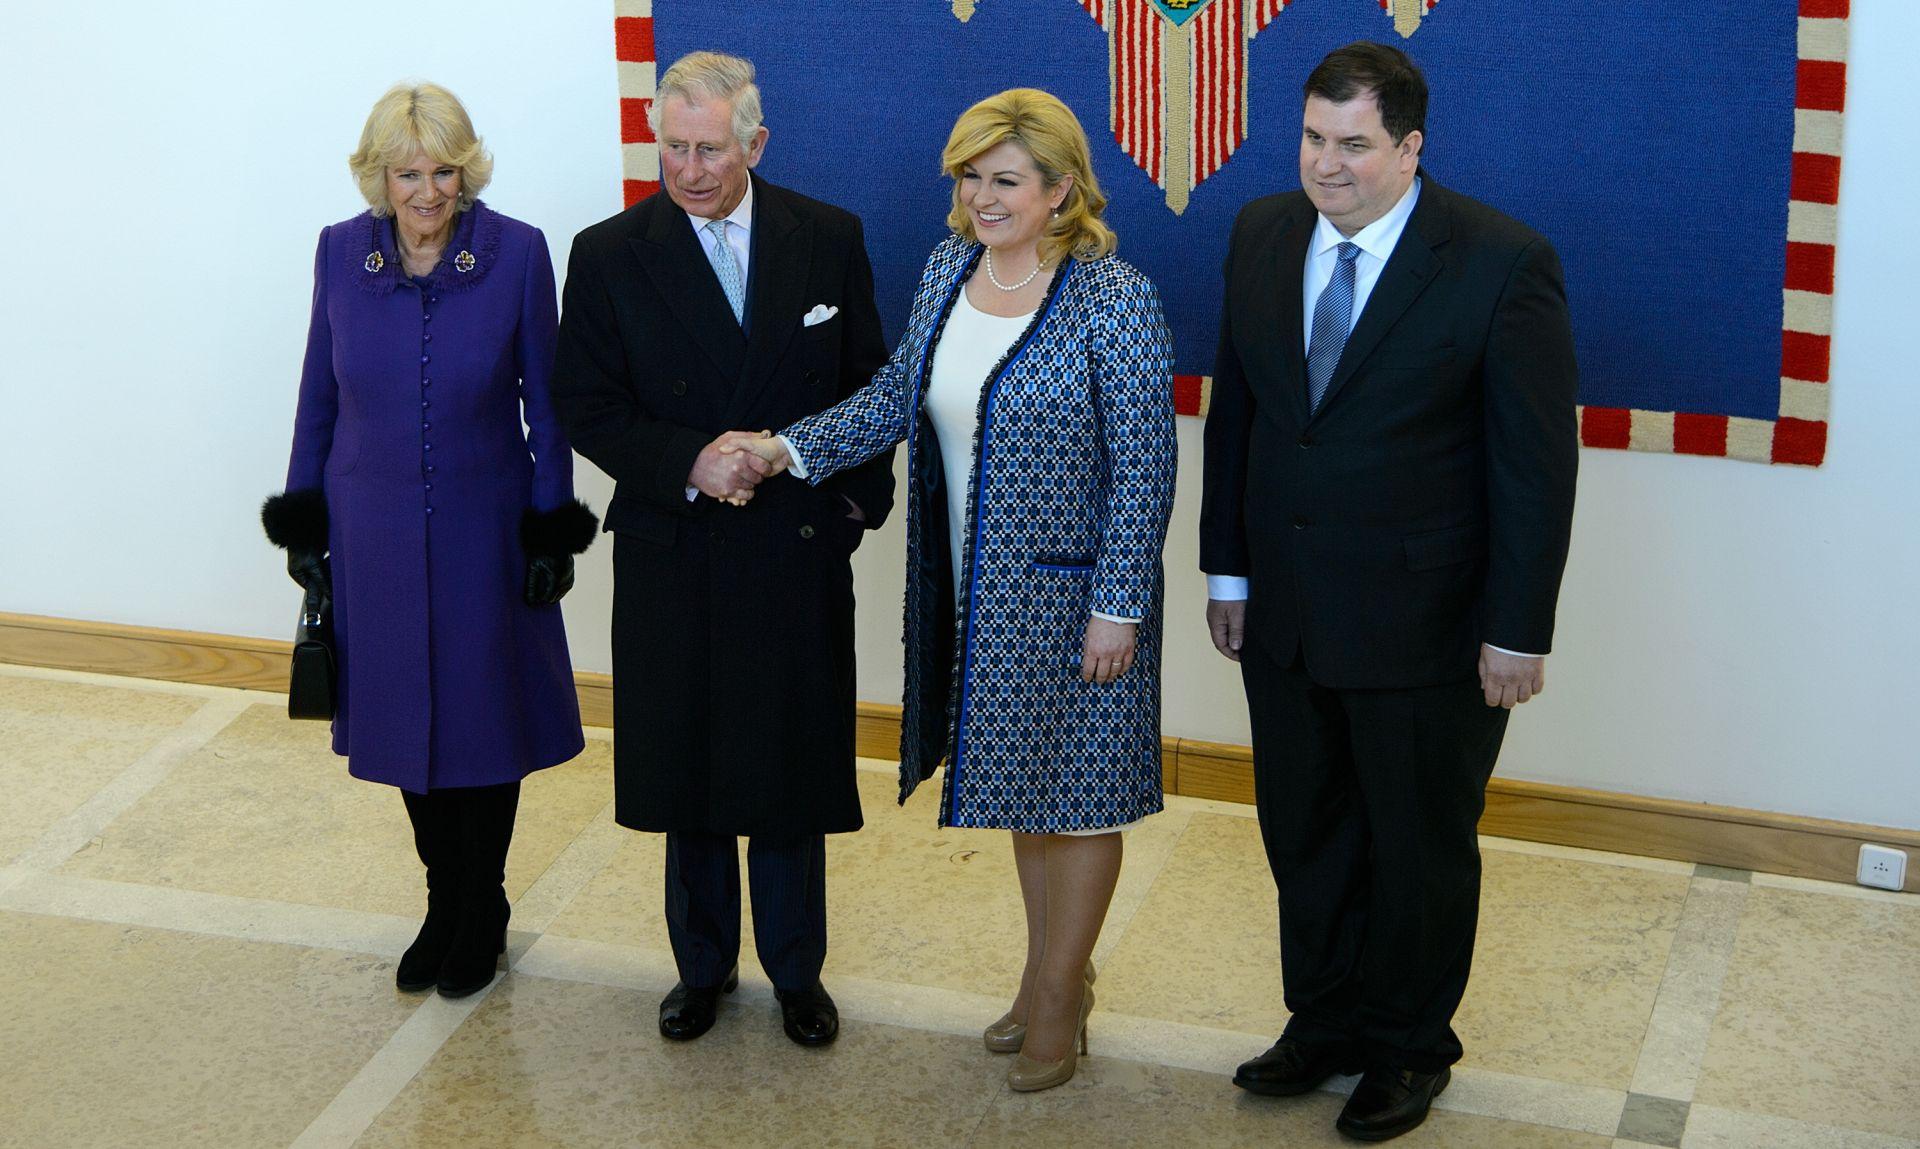 UŽIVO: Princ Charles i Camilla u Zagrebu